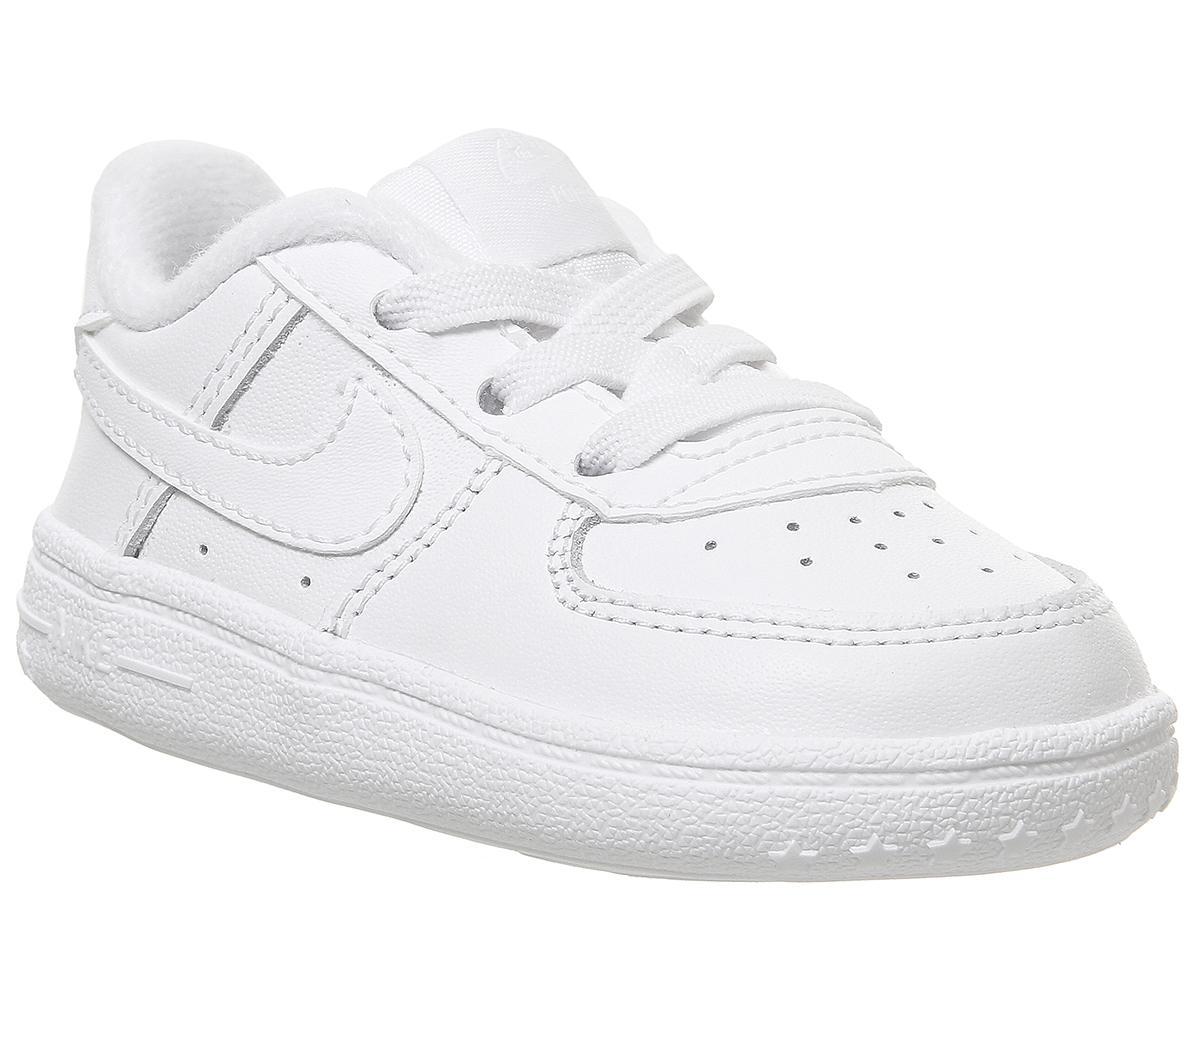 Nike Air Force 1 Crib White - Unisex